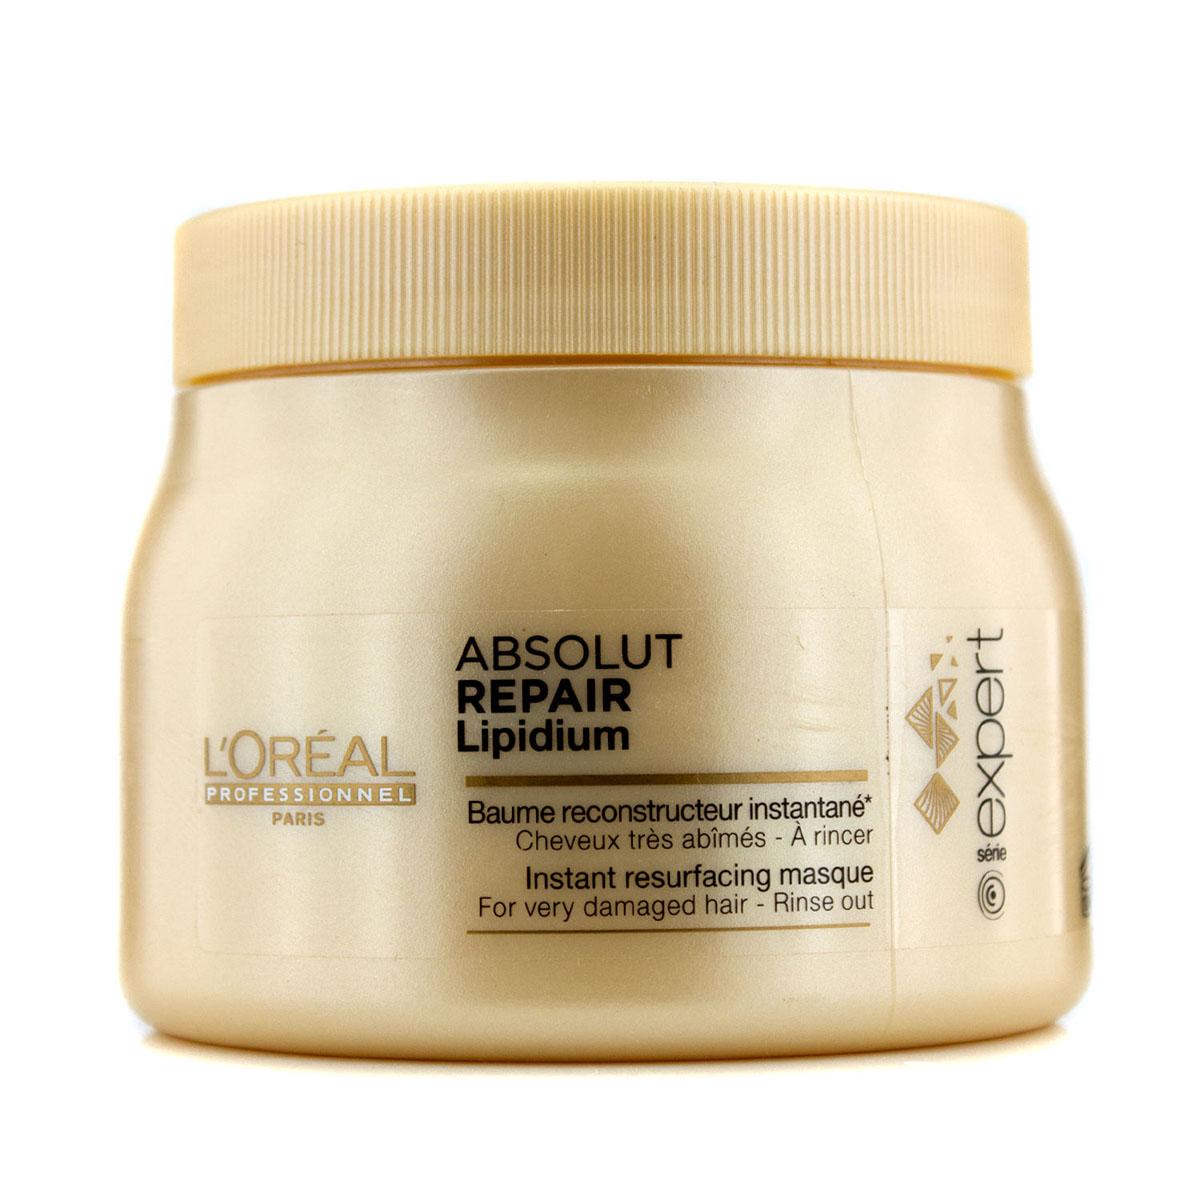 L'Oreal Professionnel Маска, восстанавливающая структуру волос на клеточном уровне Expert Absolut Repair Lipidium - 500 мл